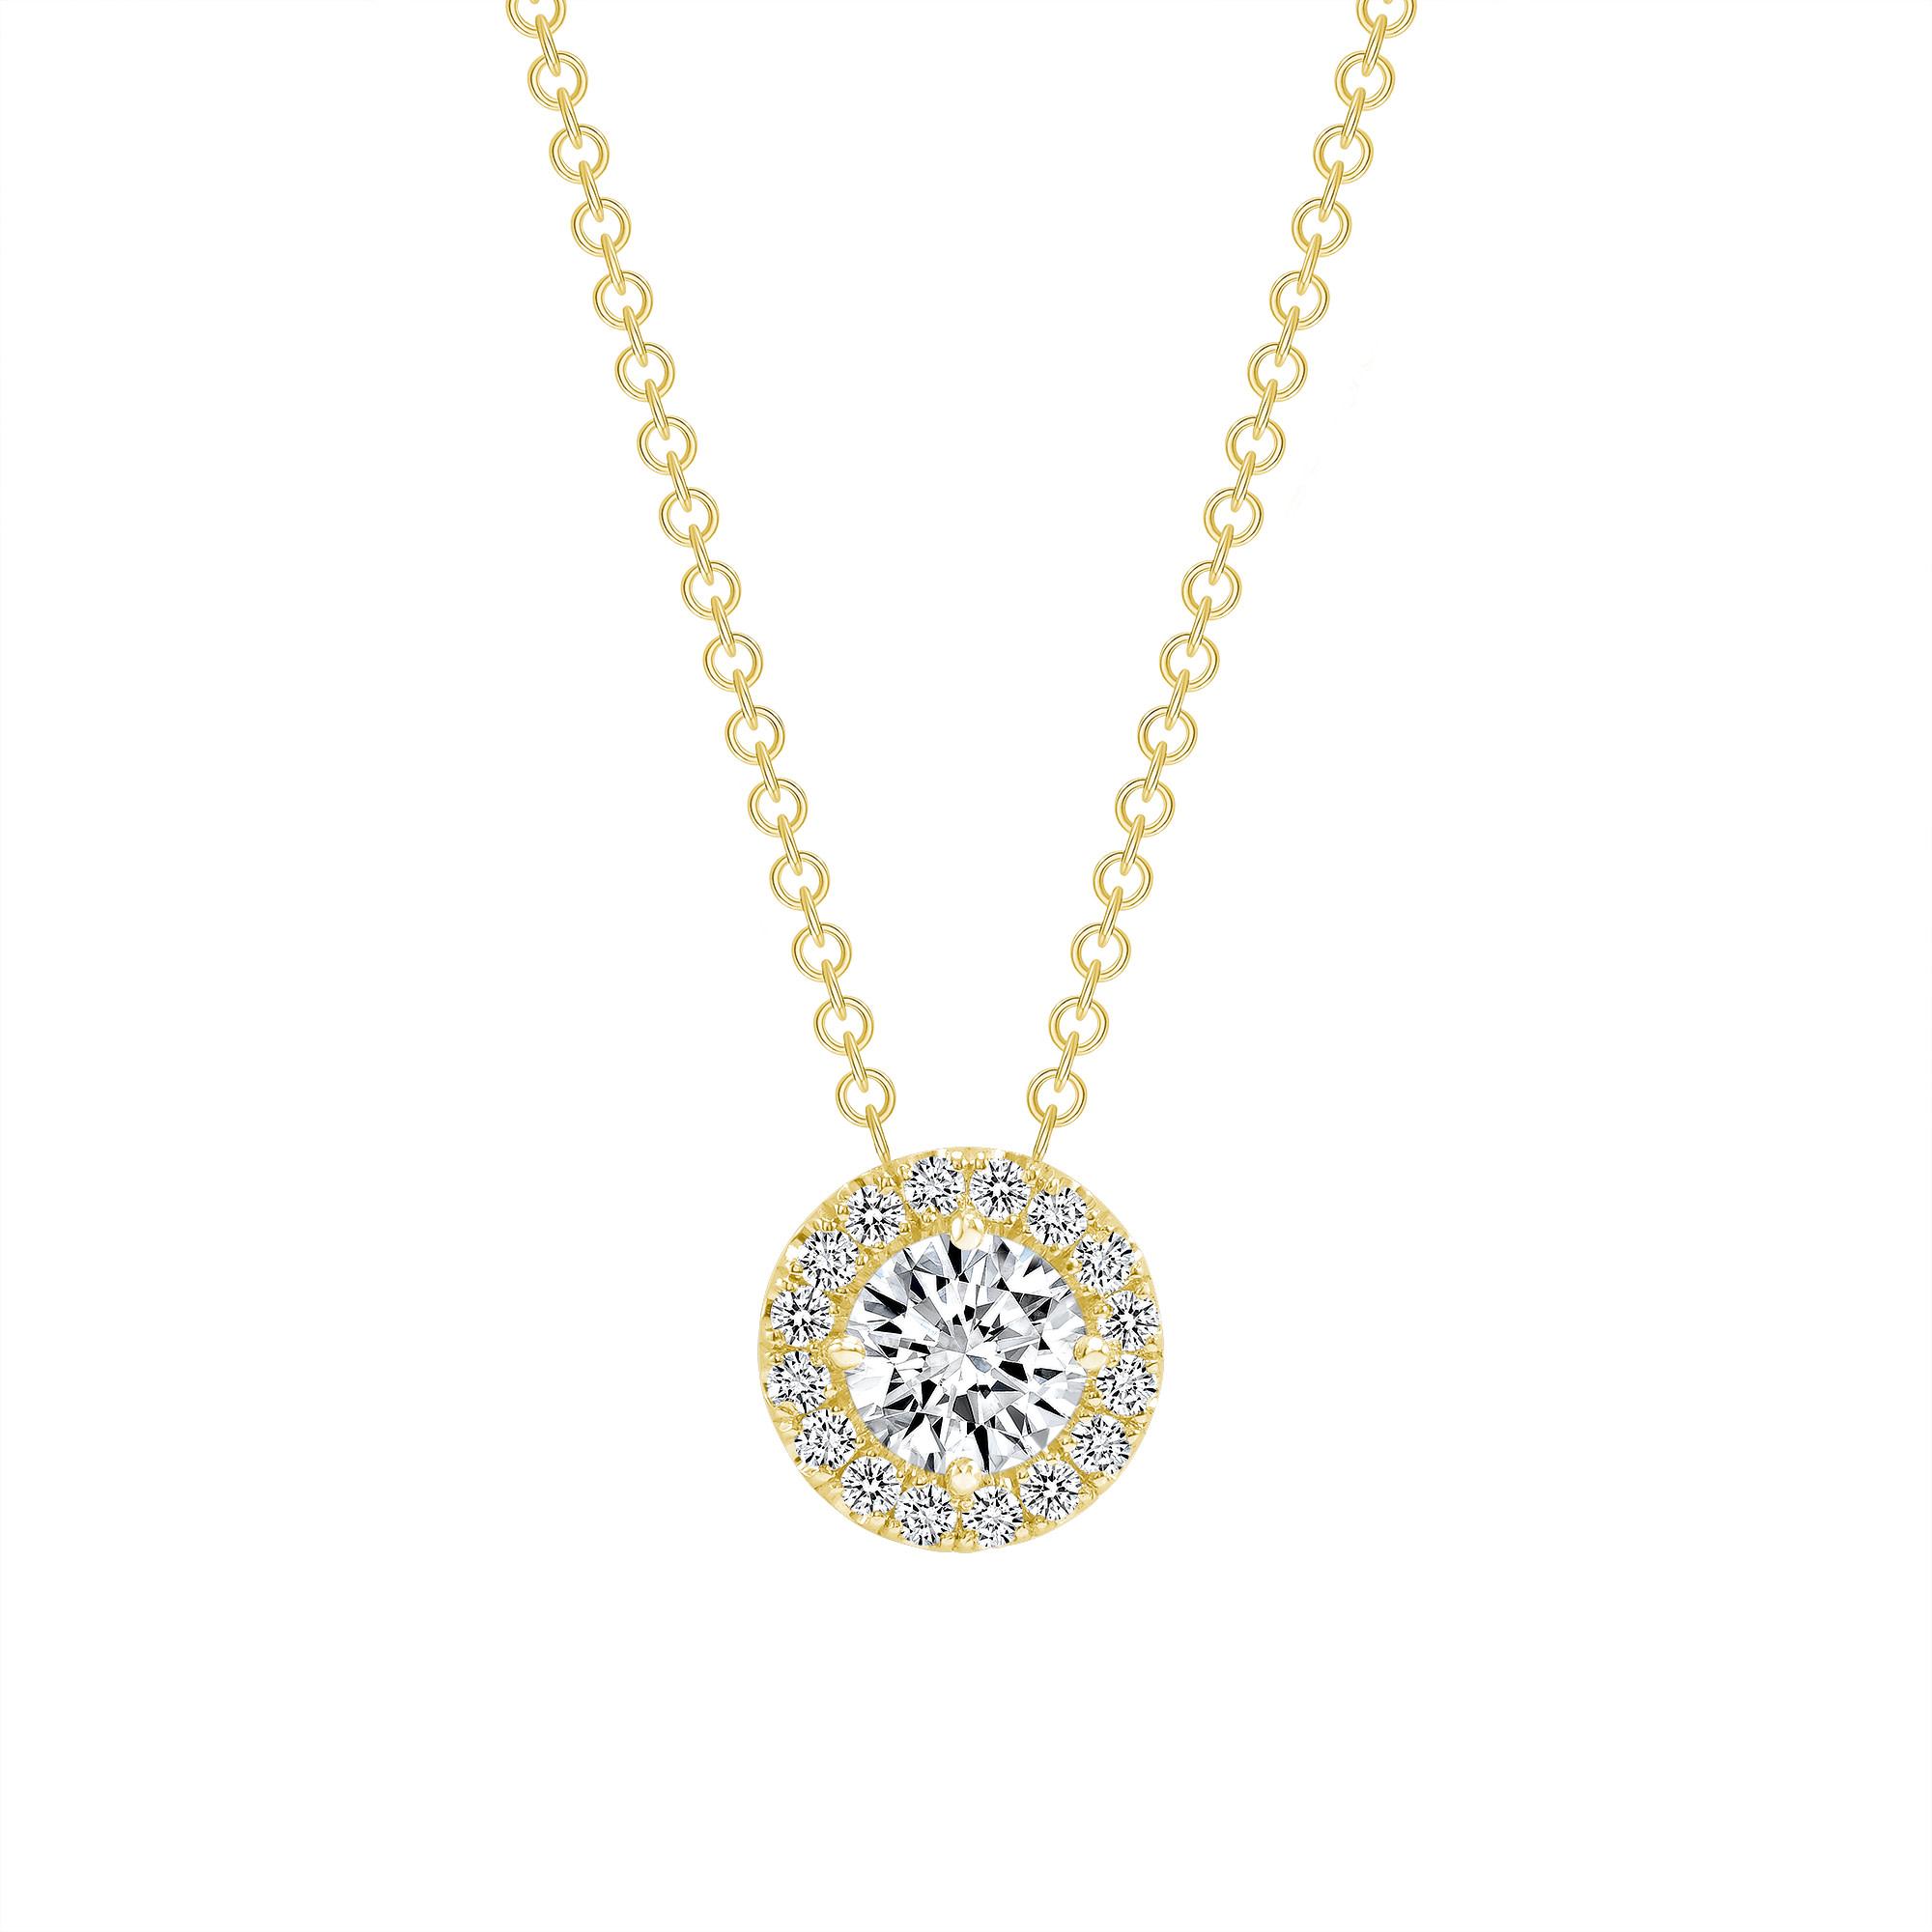 diamond double halo pendant necklace 1ct gold